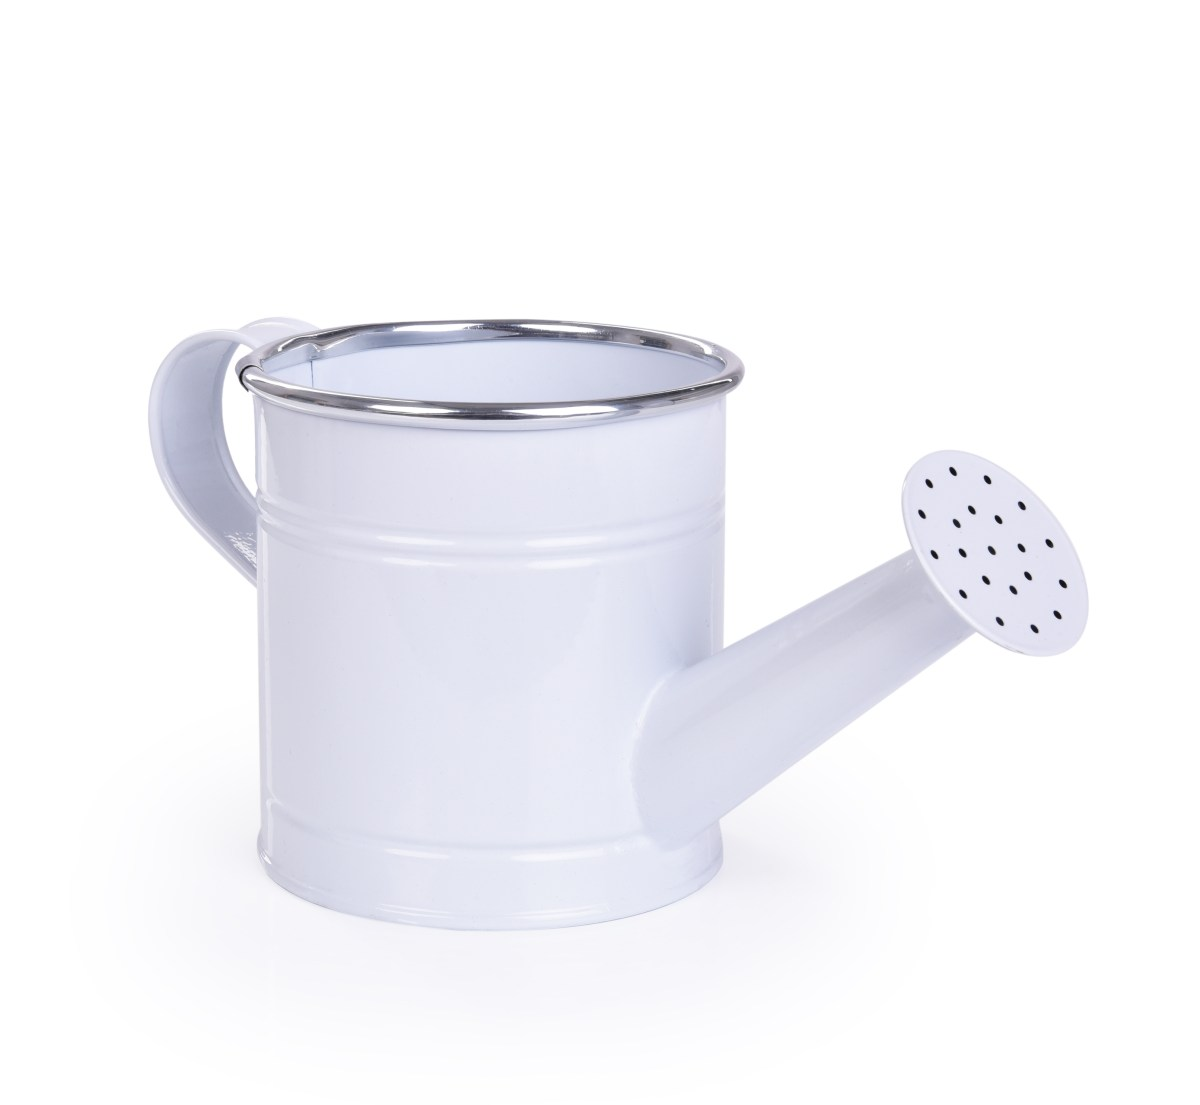 22 cm Dekorativní kovová konvička, bílá